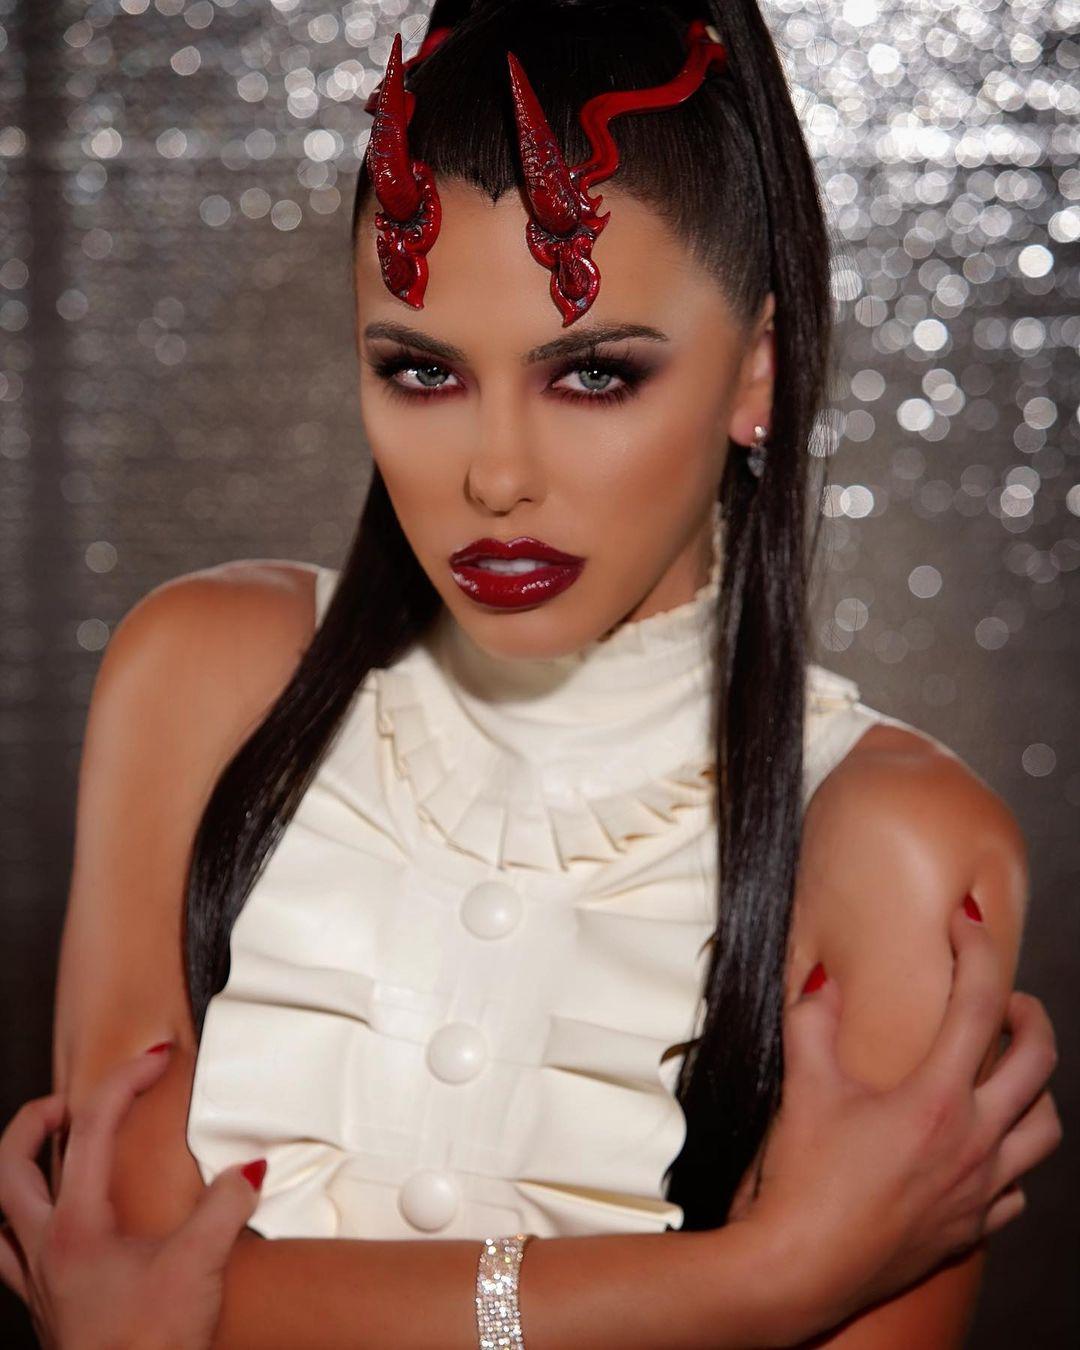 Adriana-Chechik-Wallpapers-Insta-Fit-Bio-4